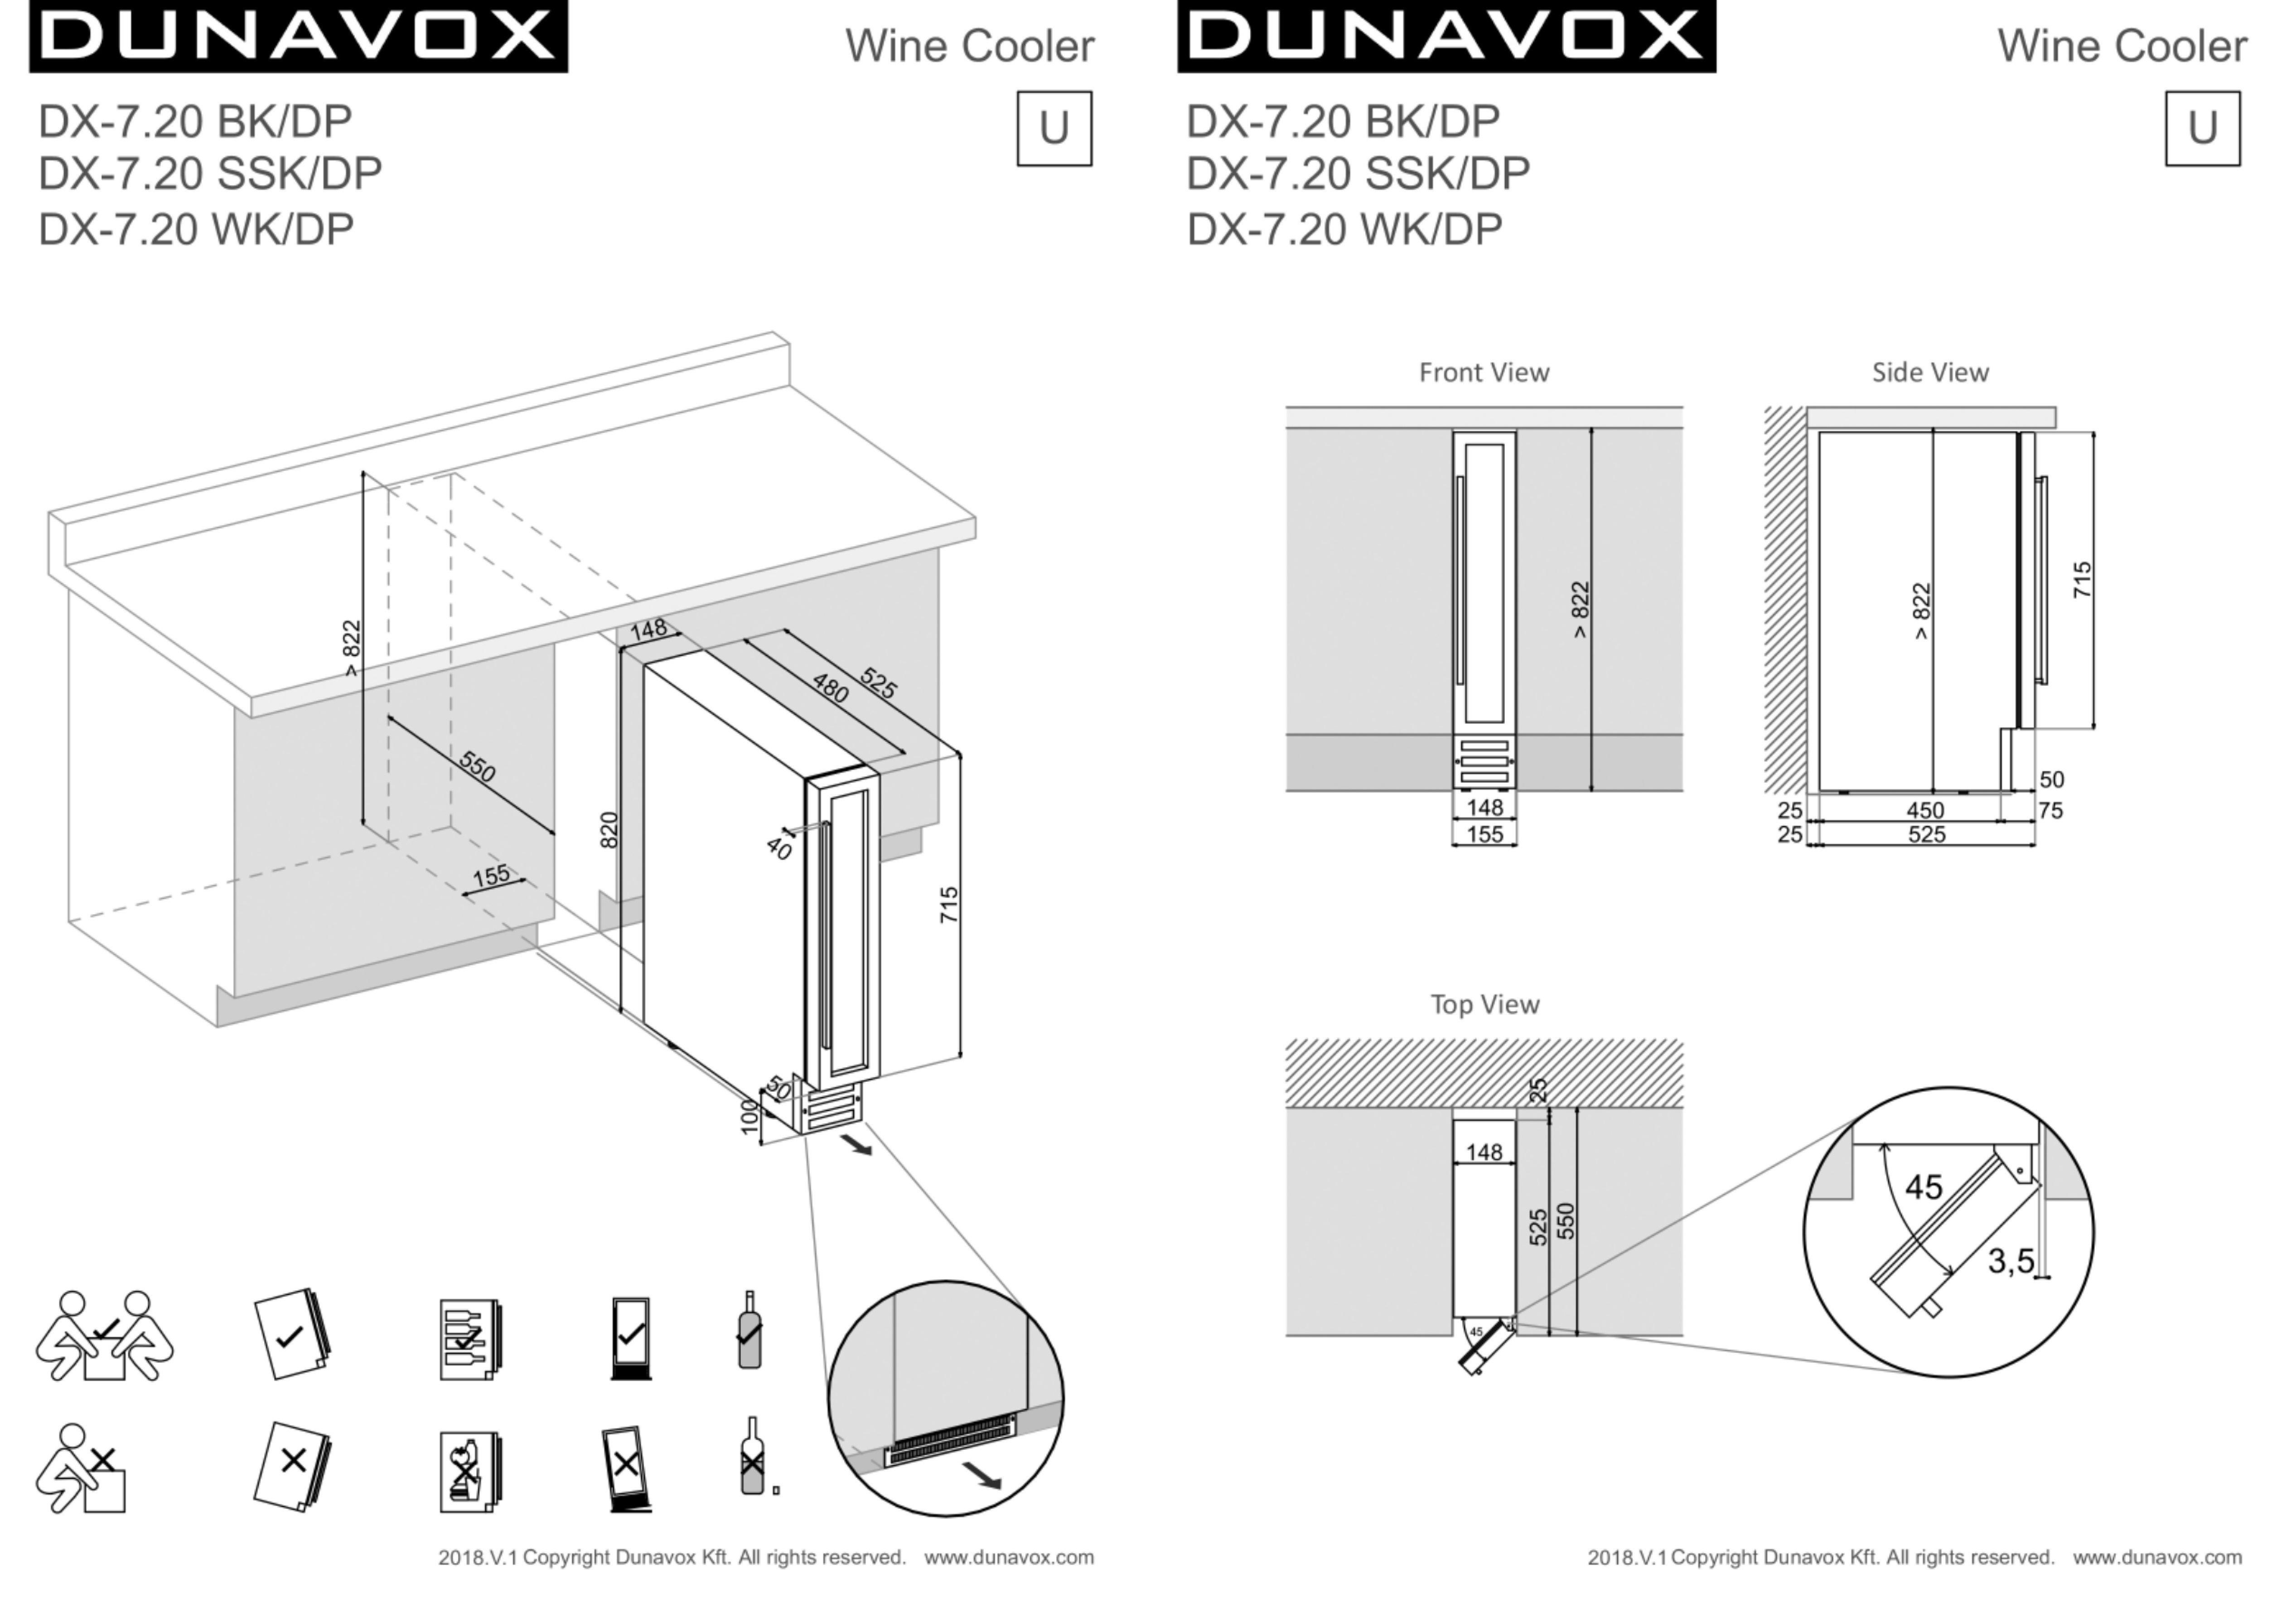 dx-7.20bkdpsskdpwkdp-installation-drawing